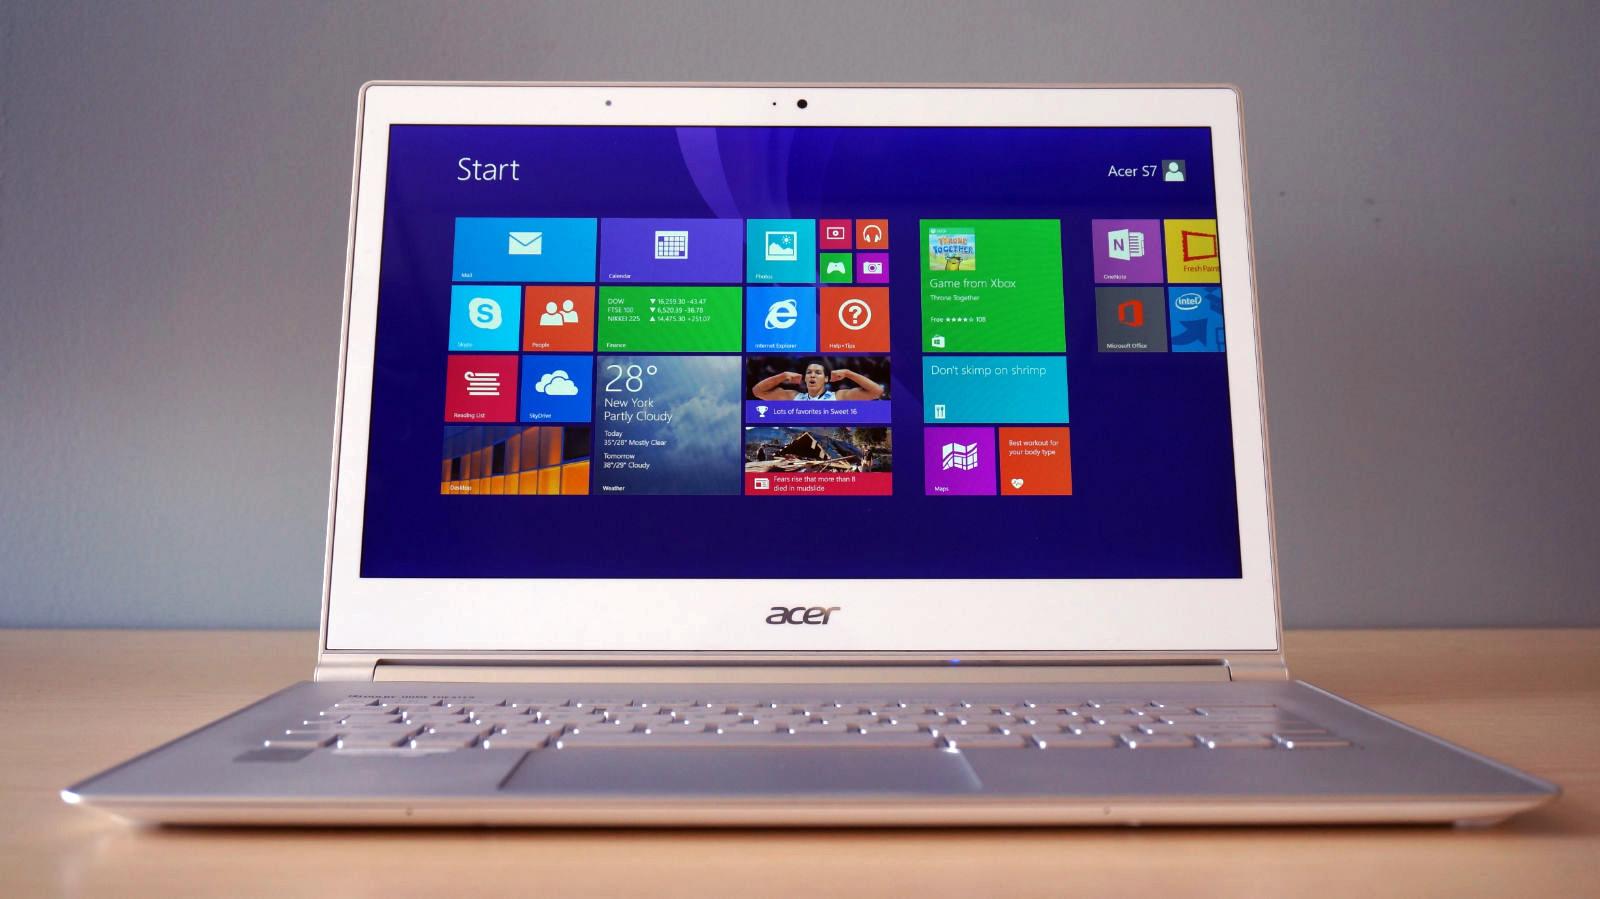 Acer Aspire S7-392 Intel WiDi Drivers Windows 7